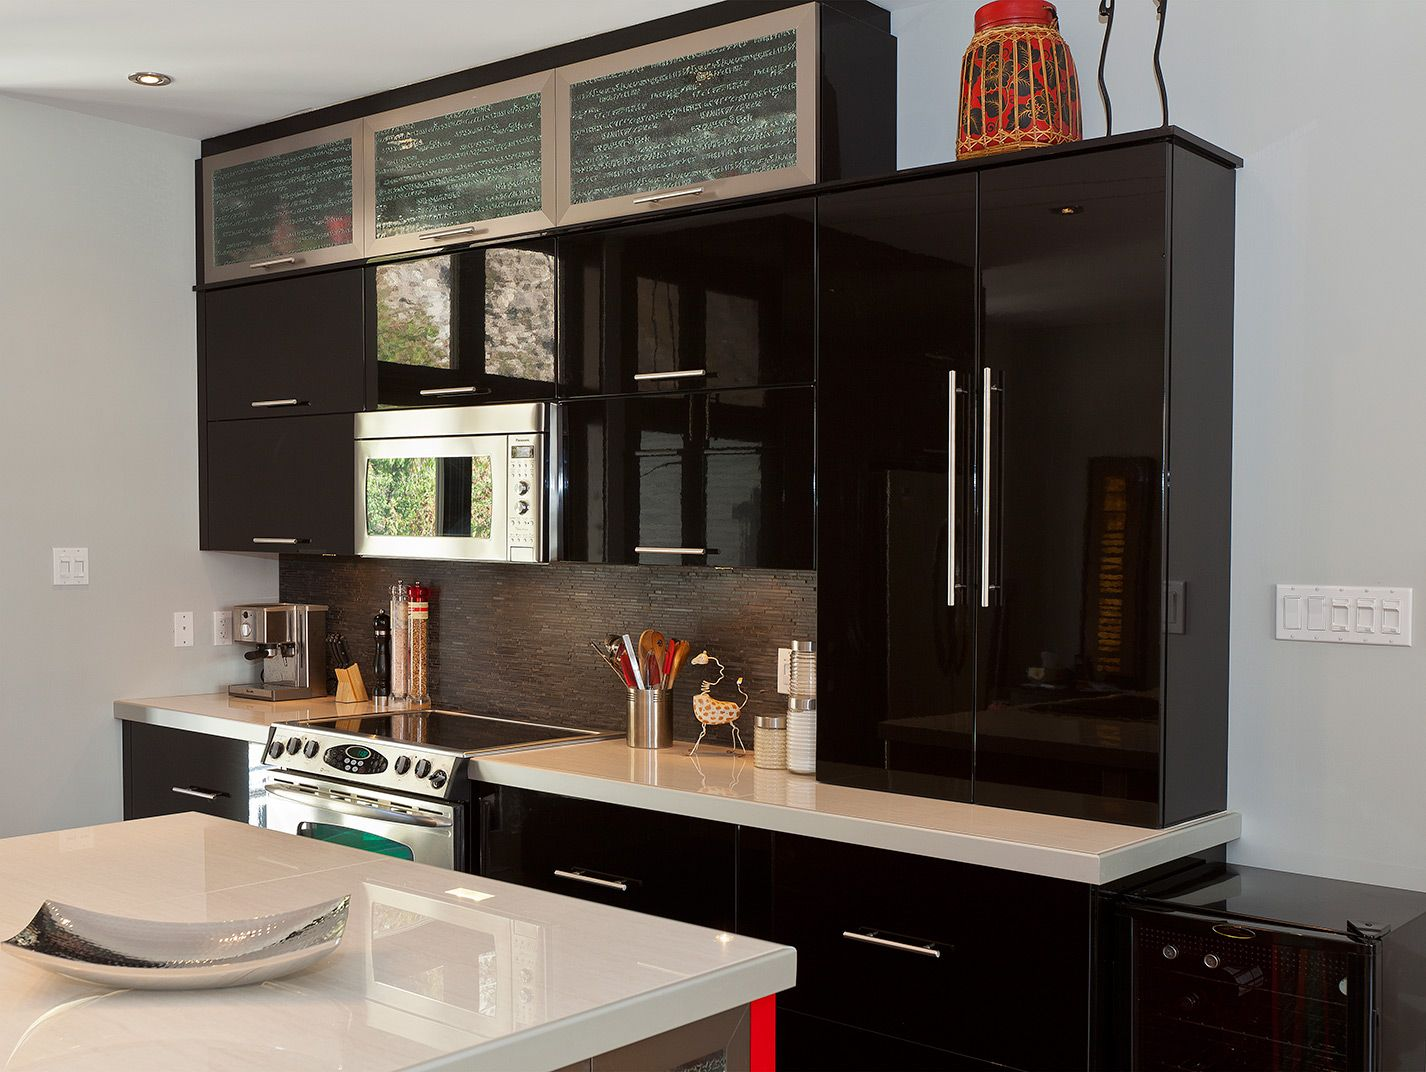 11 cuisine moderne 2014 roubaix - Cuisine moderne 2014 ...